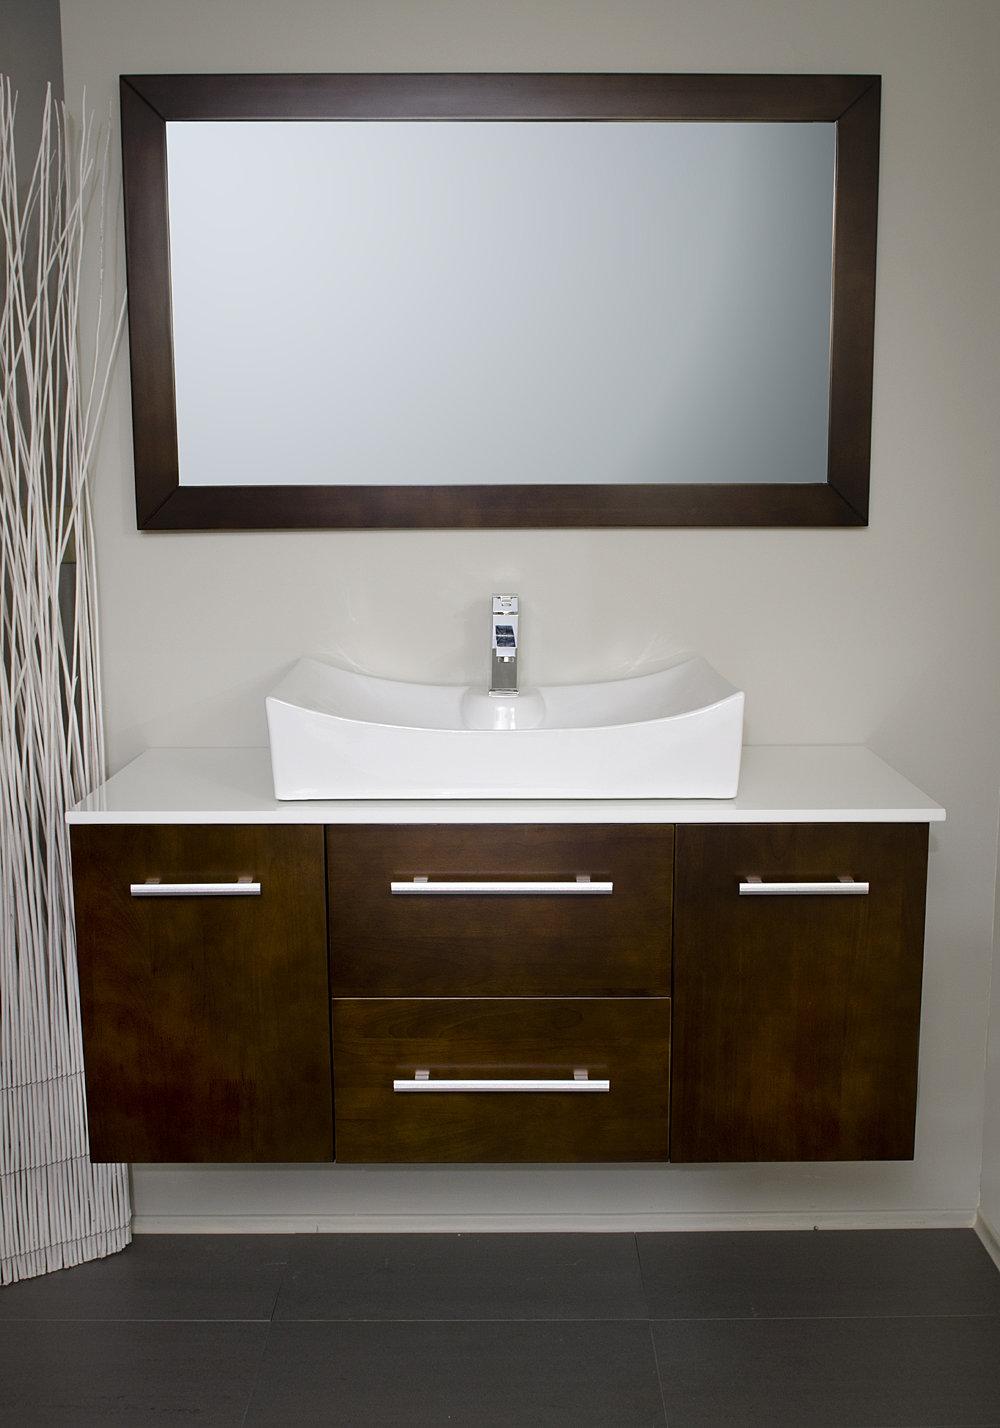 Image Result For Vanity Bathroom